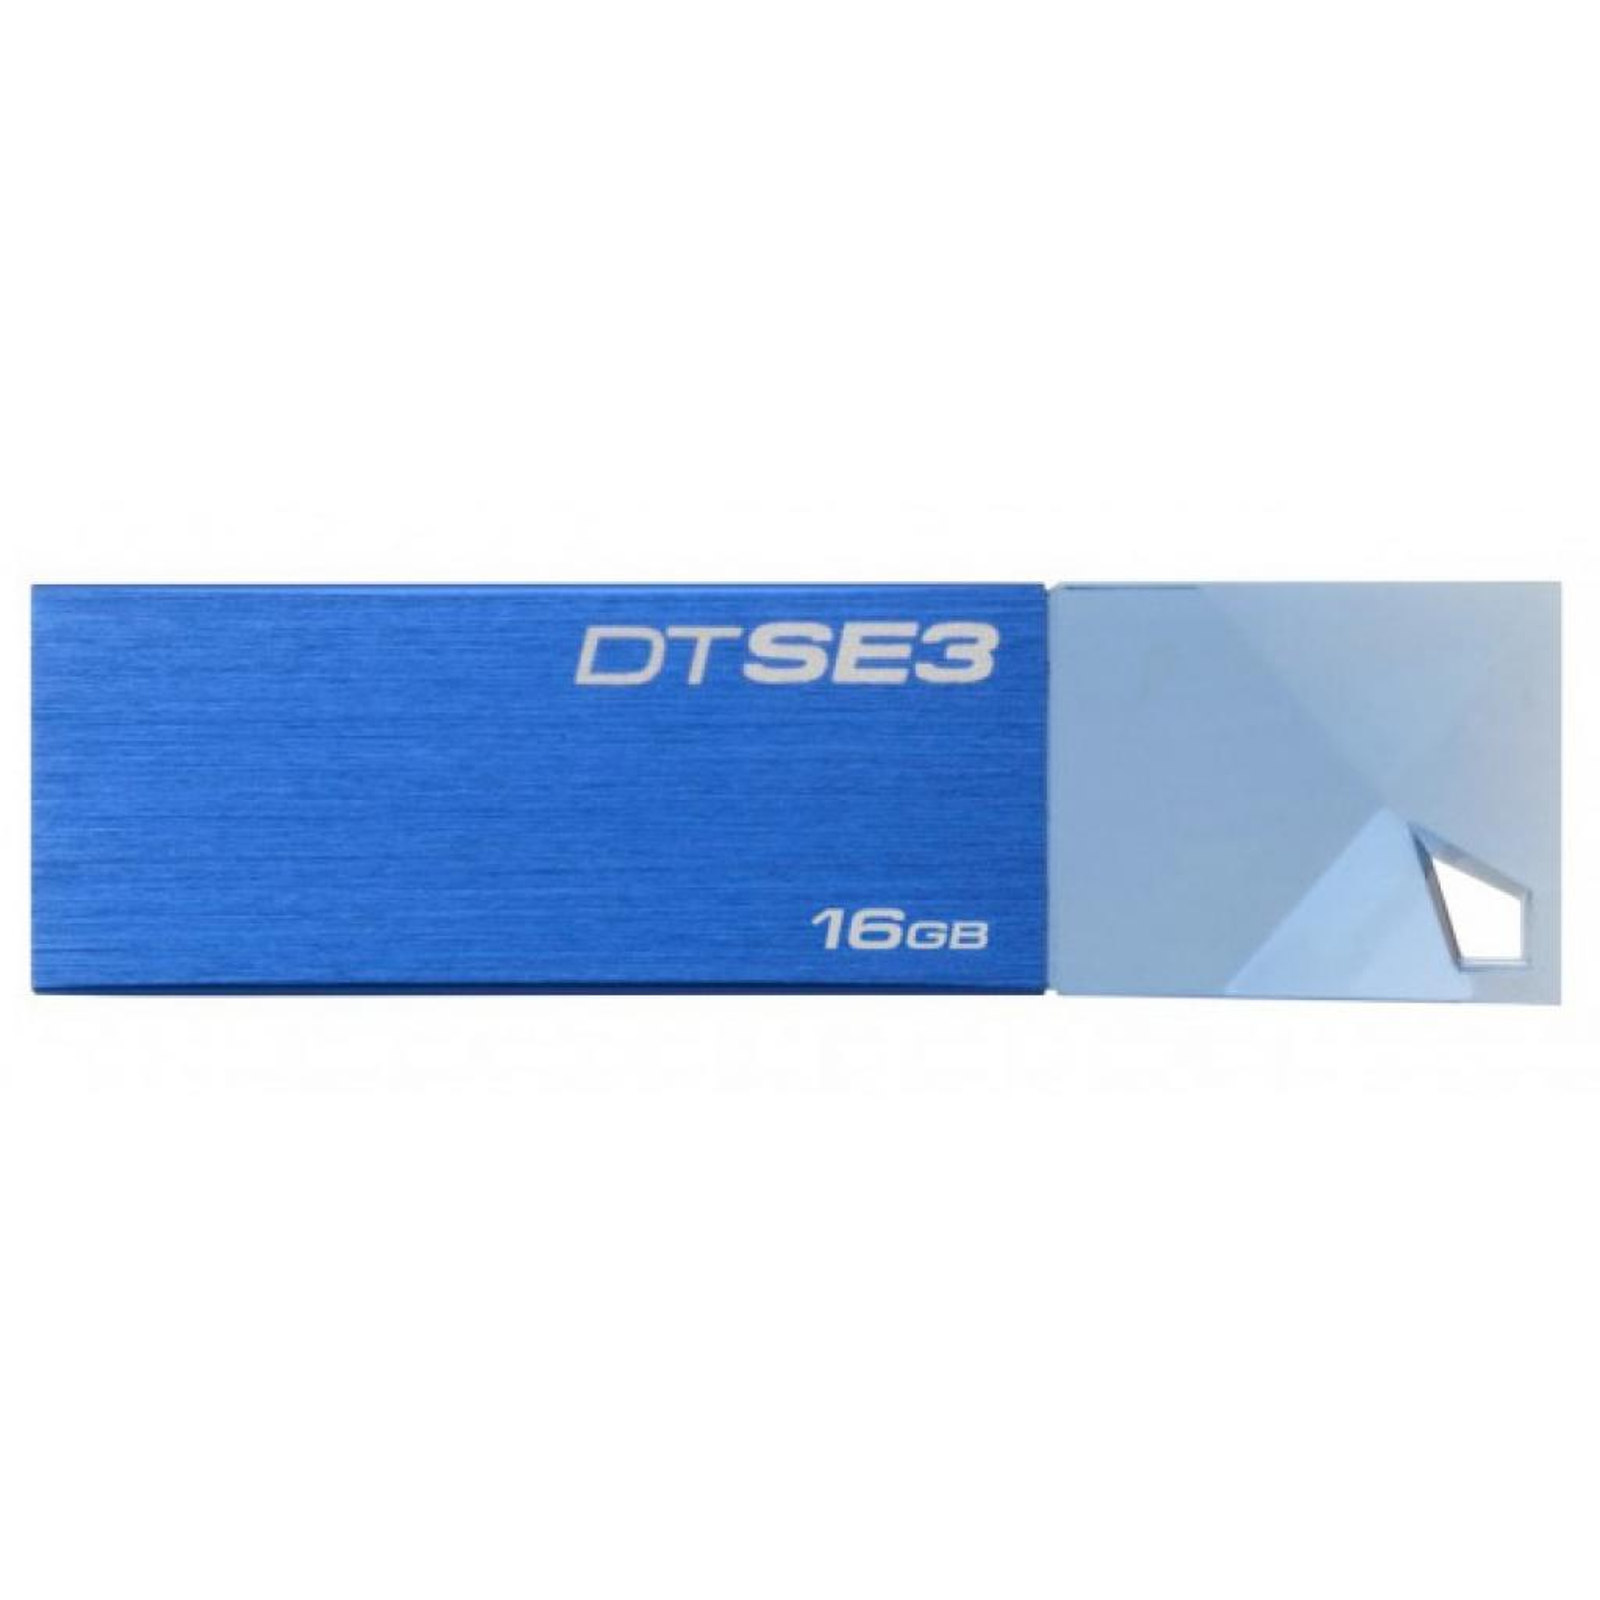 USB флеш накопитель Kingston 16GB DTSE3 Metalic Blue USB 2.0 (KC-U6816-4C1B)